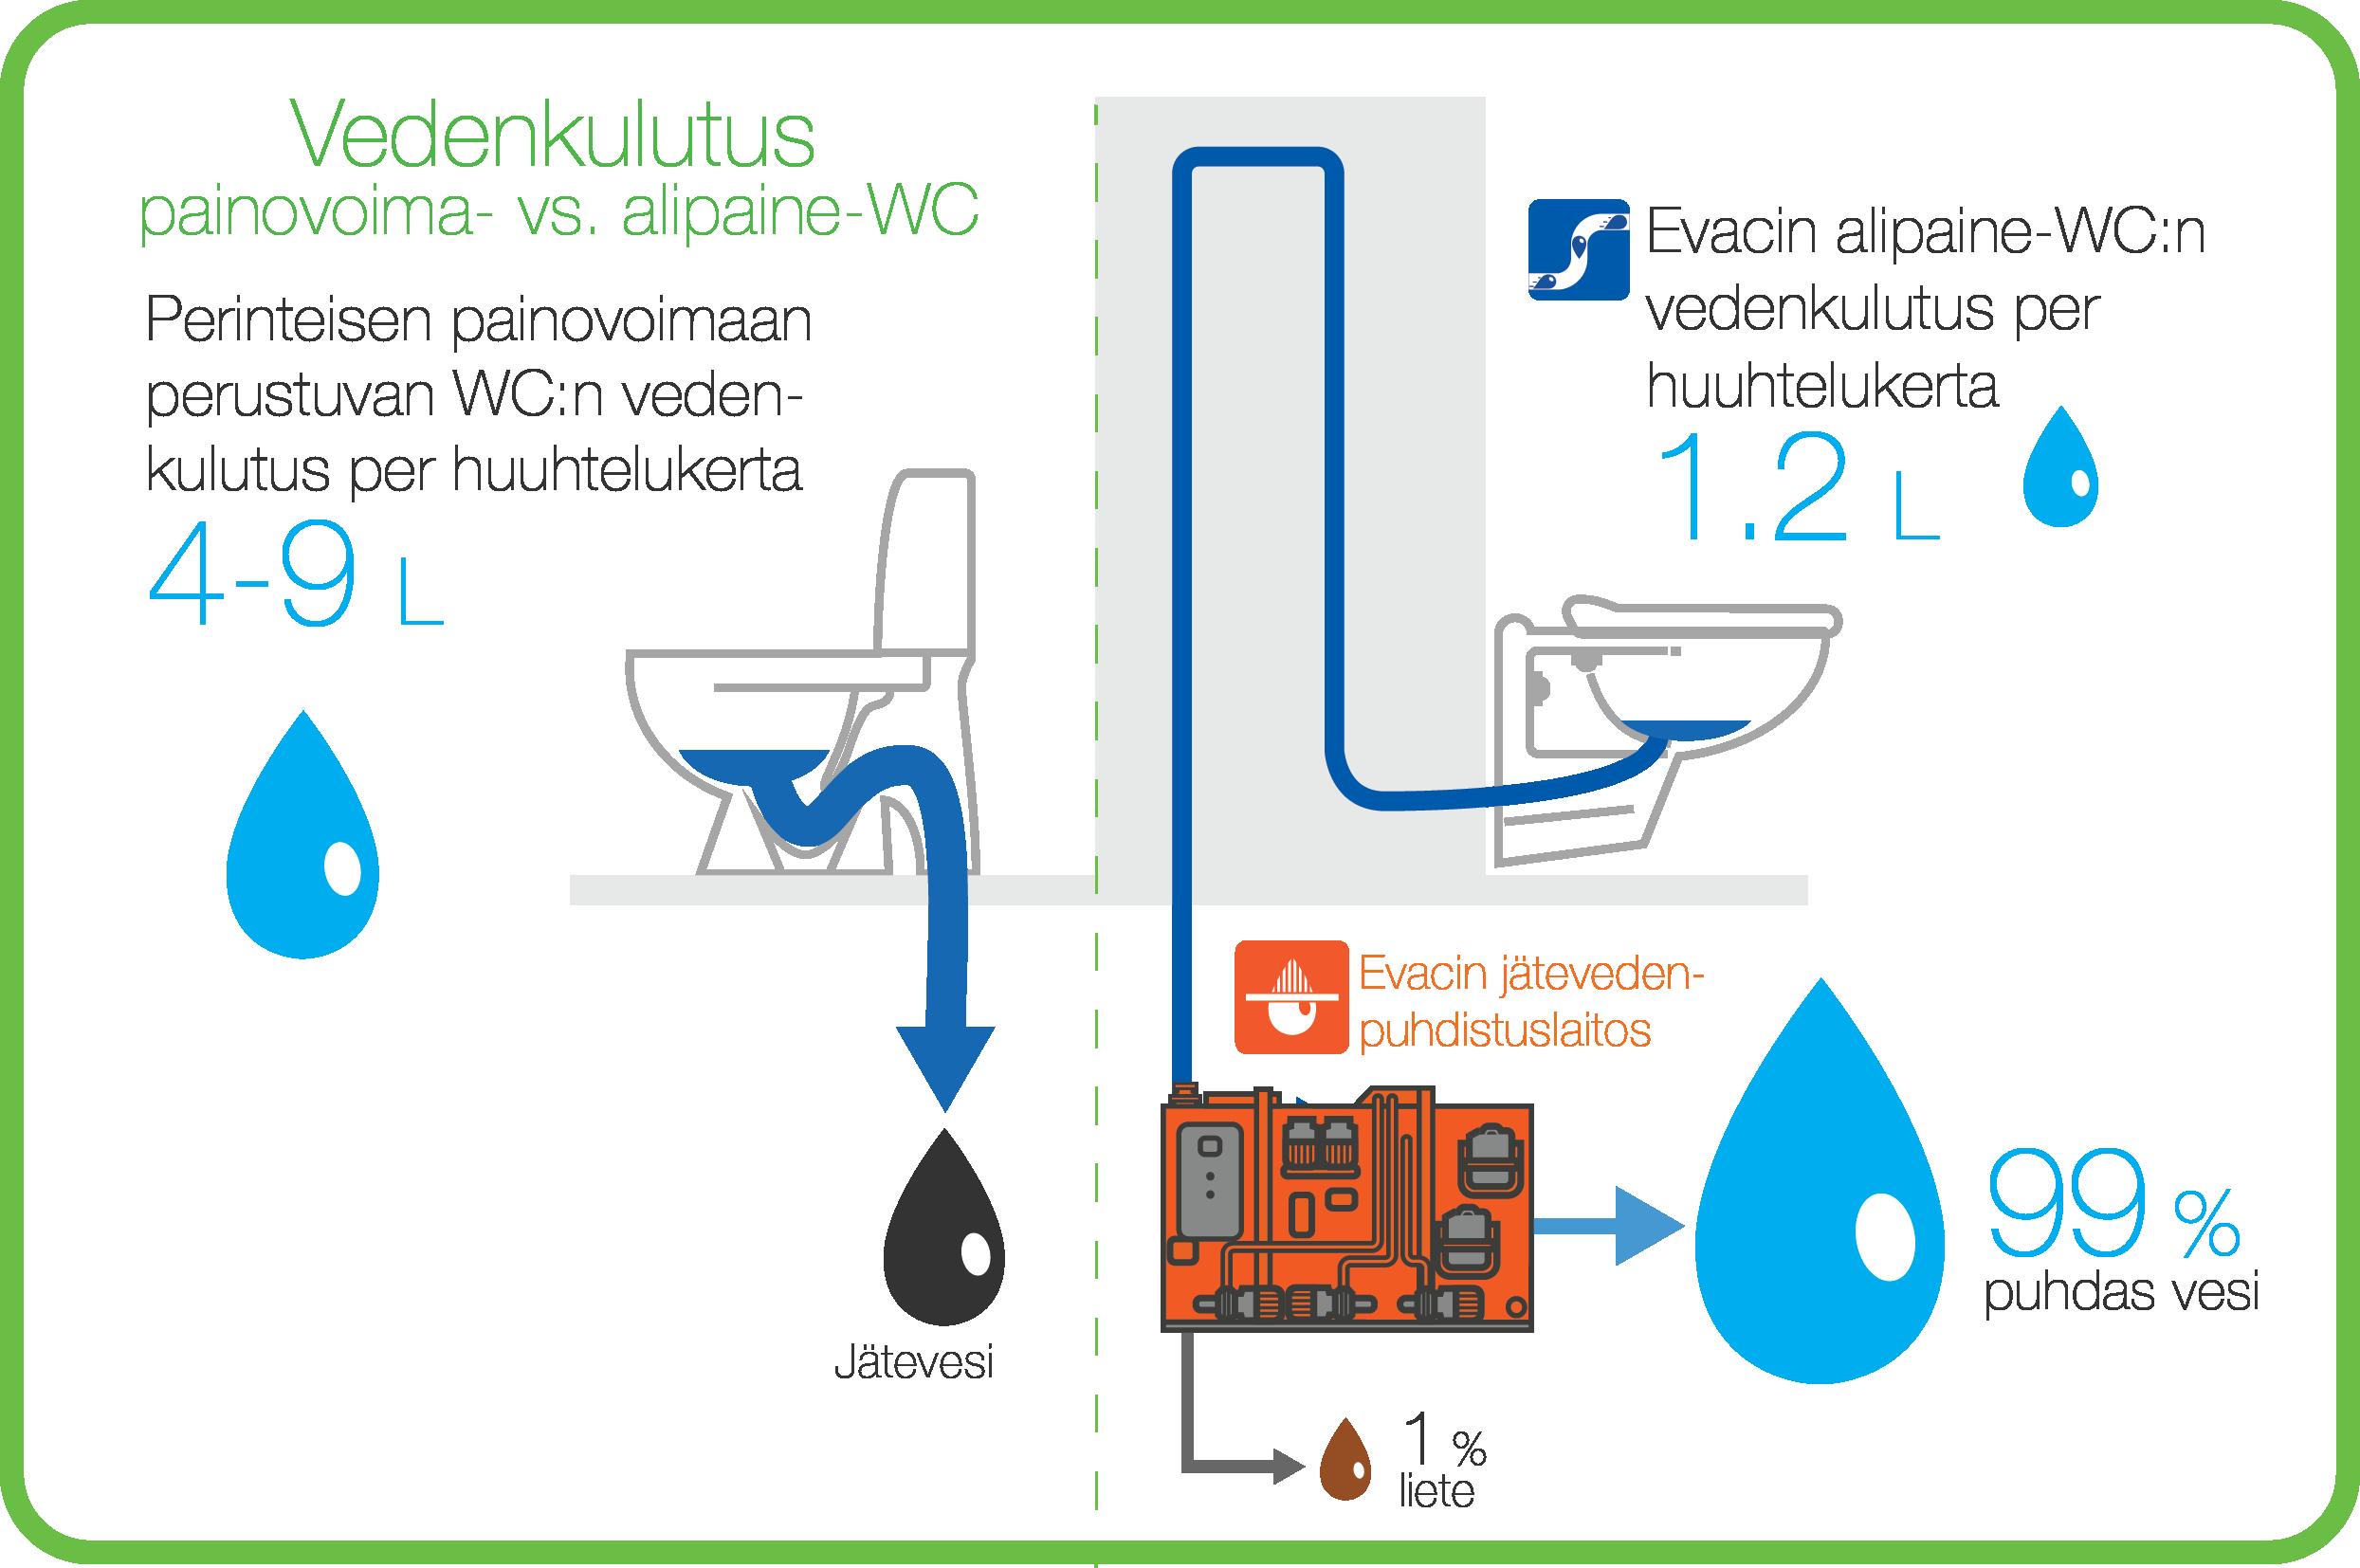 Evacin alinaine-WC:den vedenkulutus